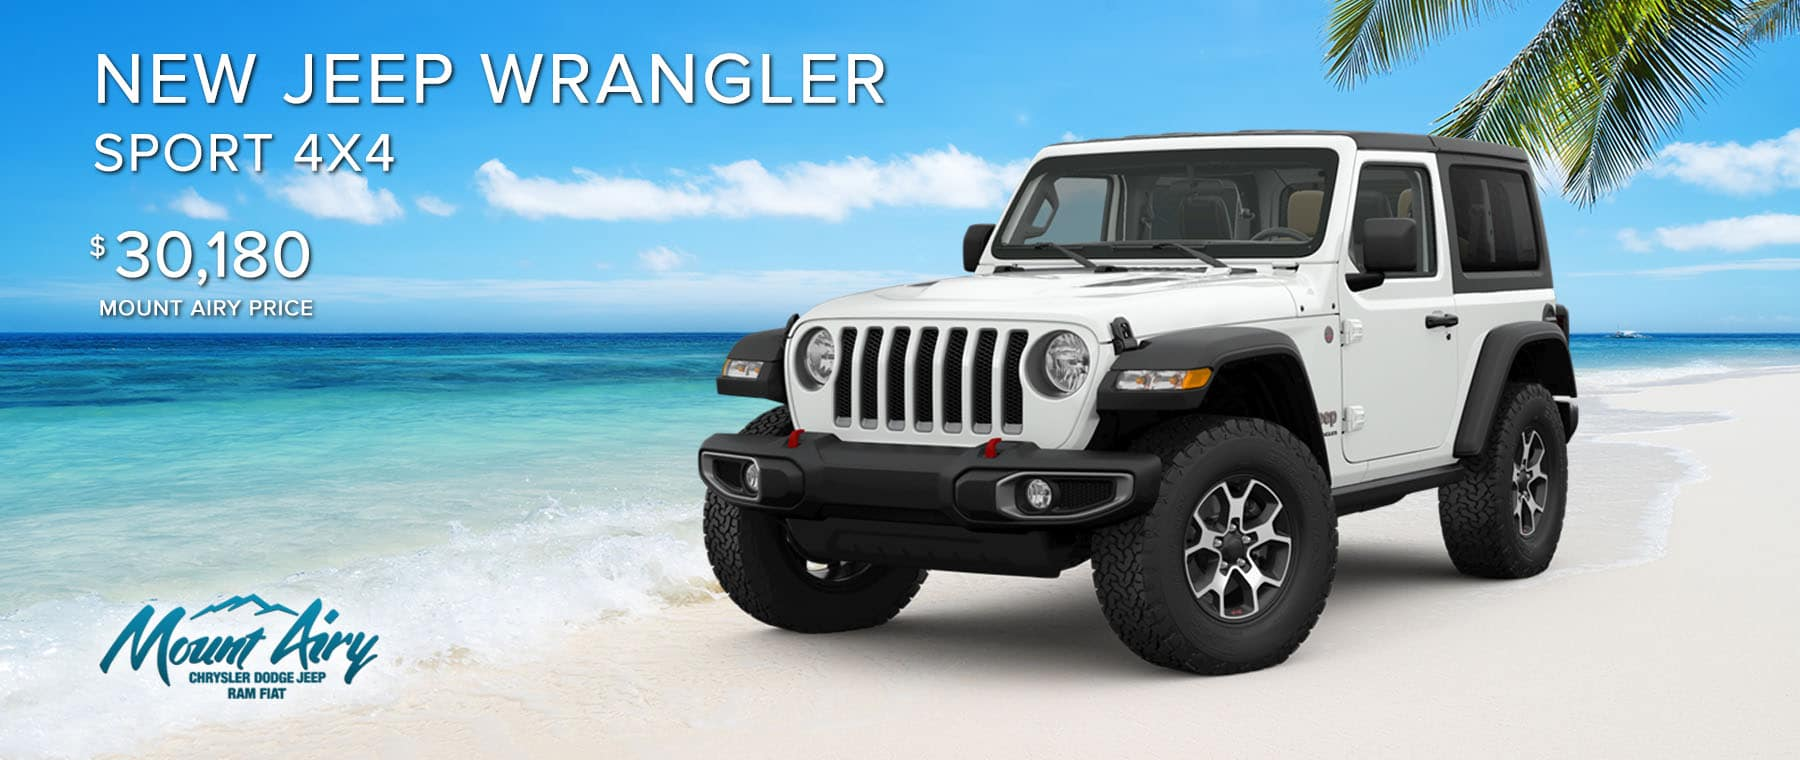 White New Jeep Wrangler on sale